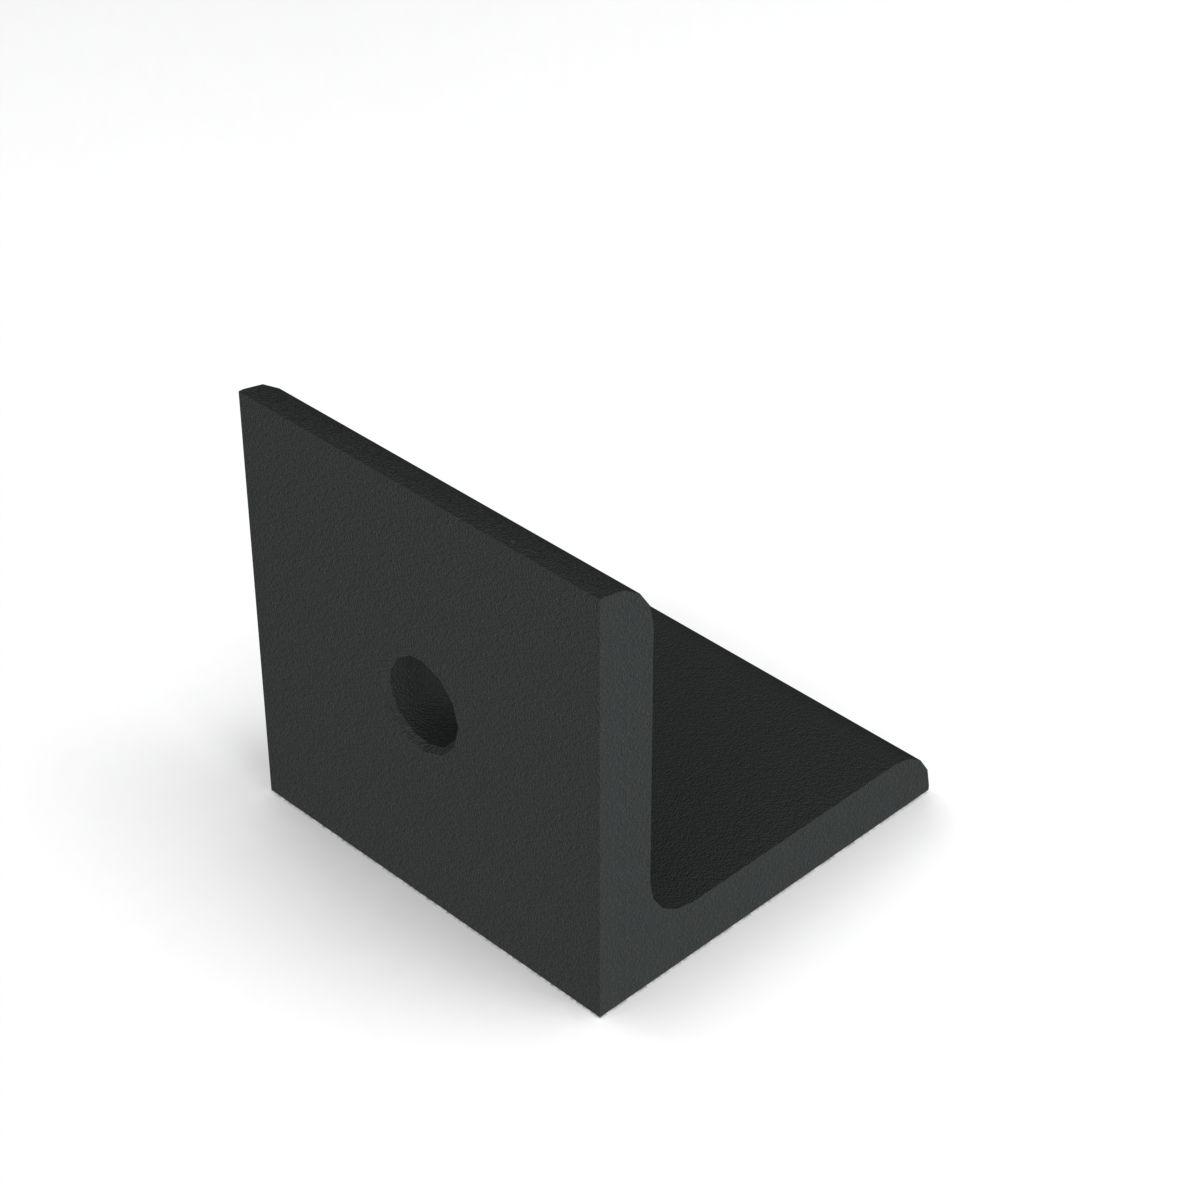 aluminium verbindingshoek 4040 zwart